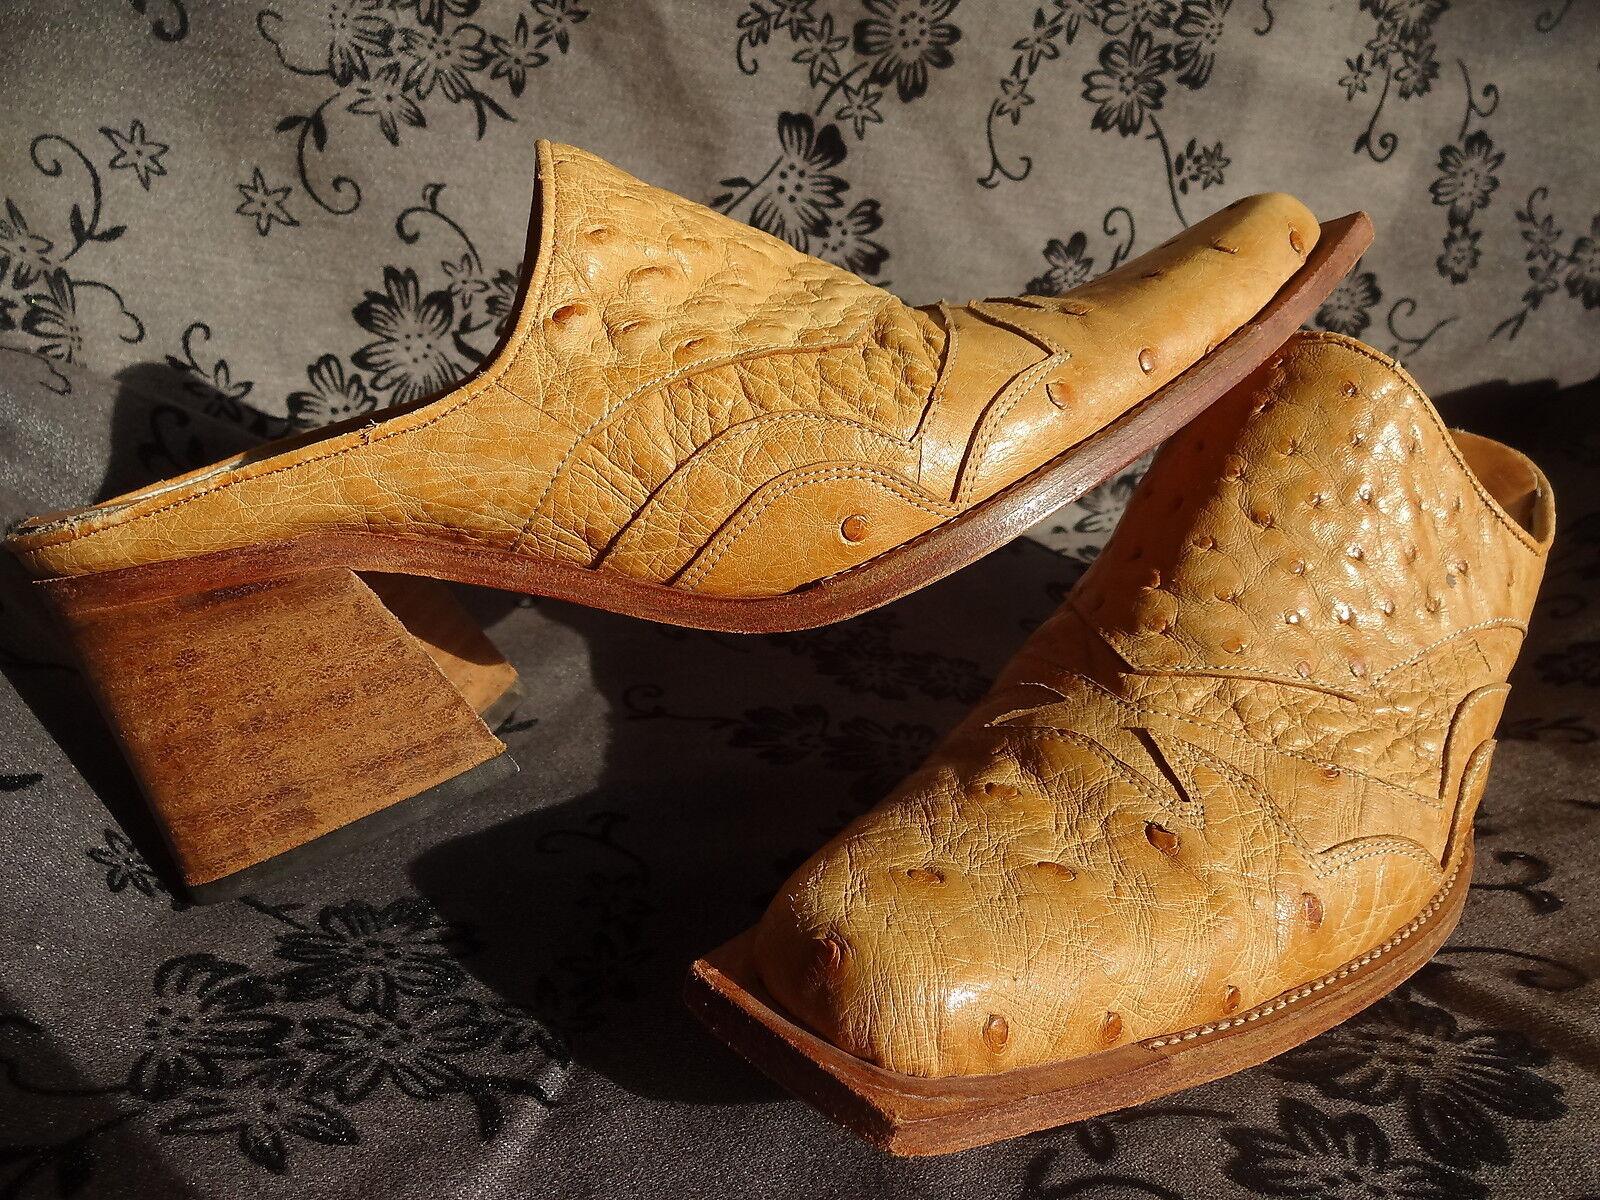 ALAN FUNG CHAUSSURE MULE SANTIAG FEMME CUIR AUTRUCHE MARRON pt 37 Schuhe OSTRICH